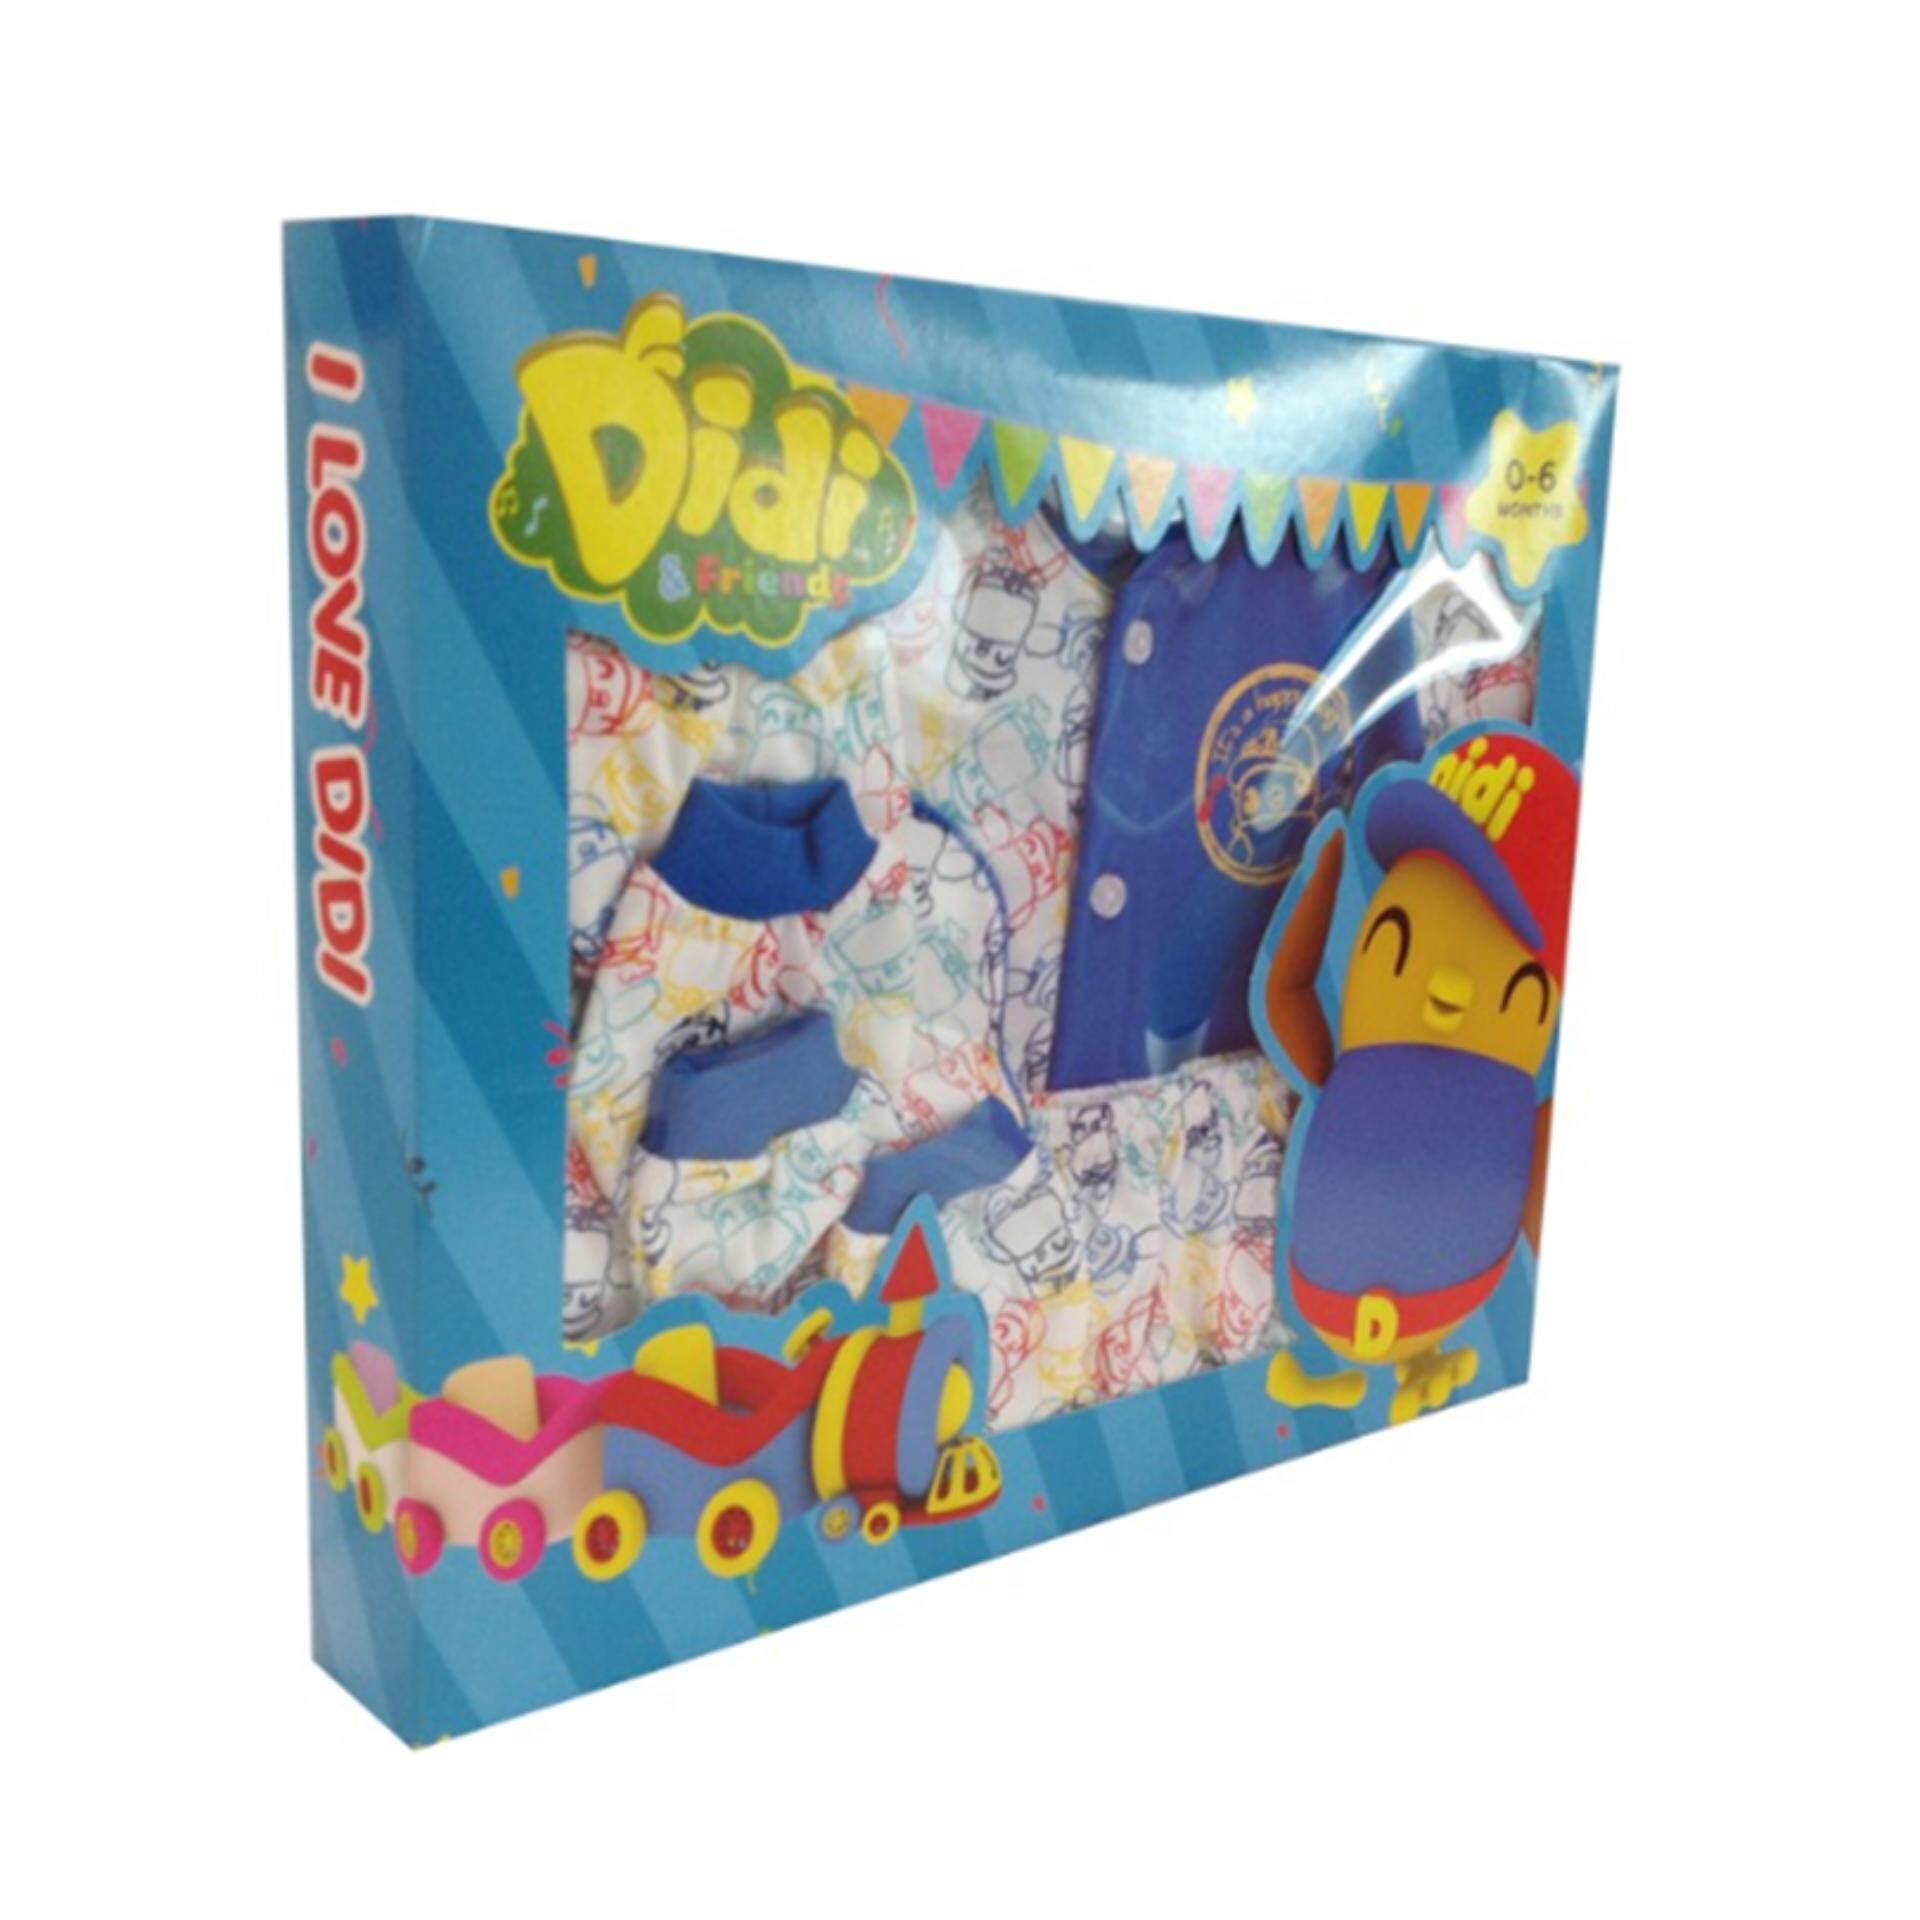 Didi & Friends Baby Gift Set - Didi